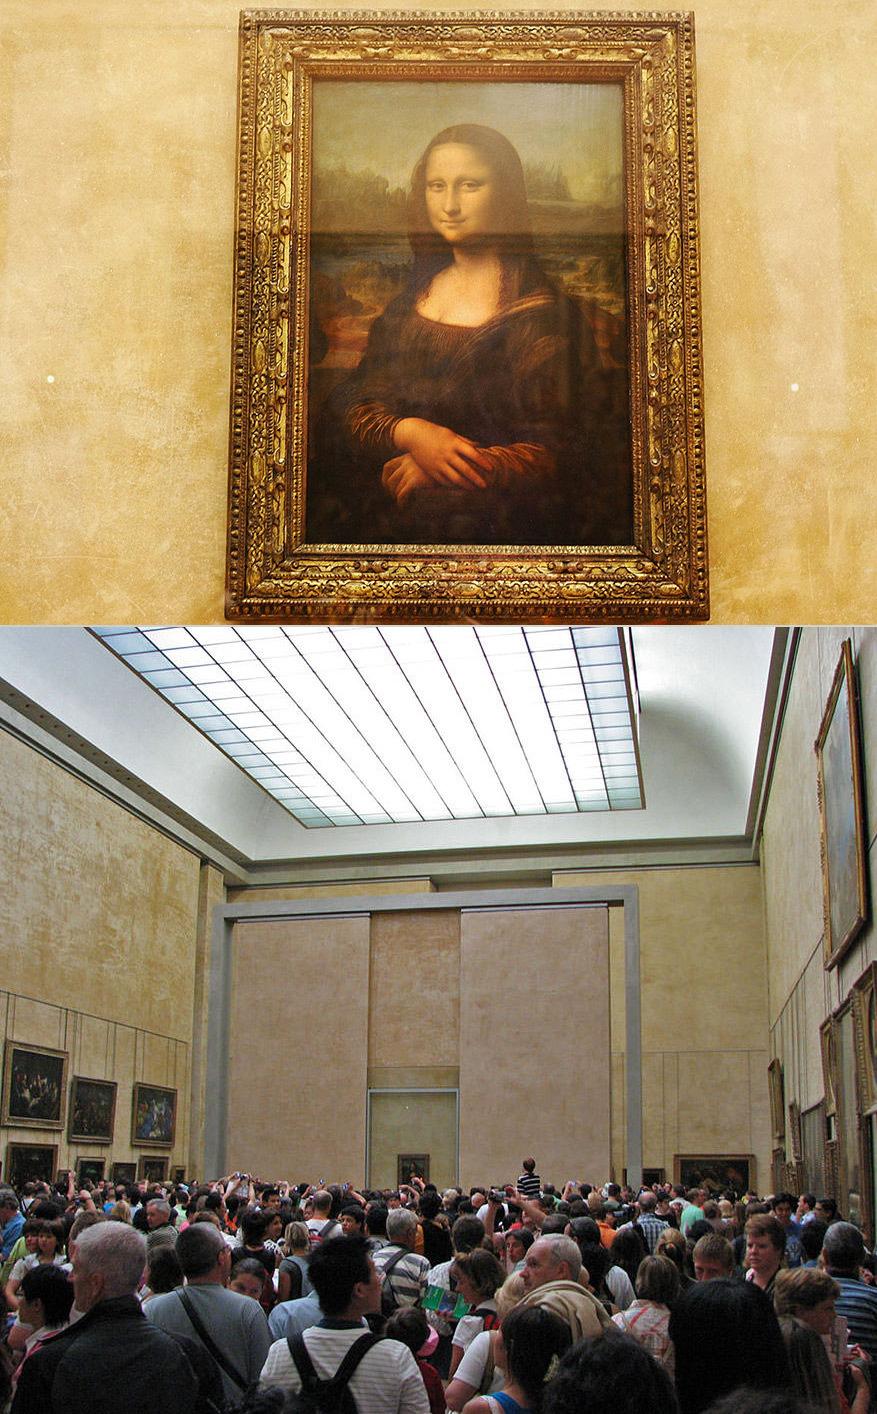 Mona Lisa au Louvre